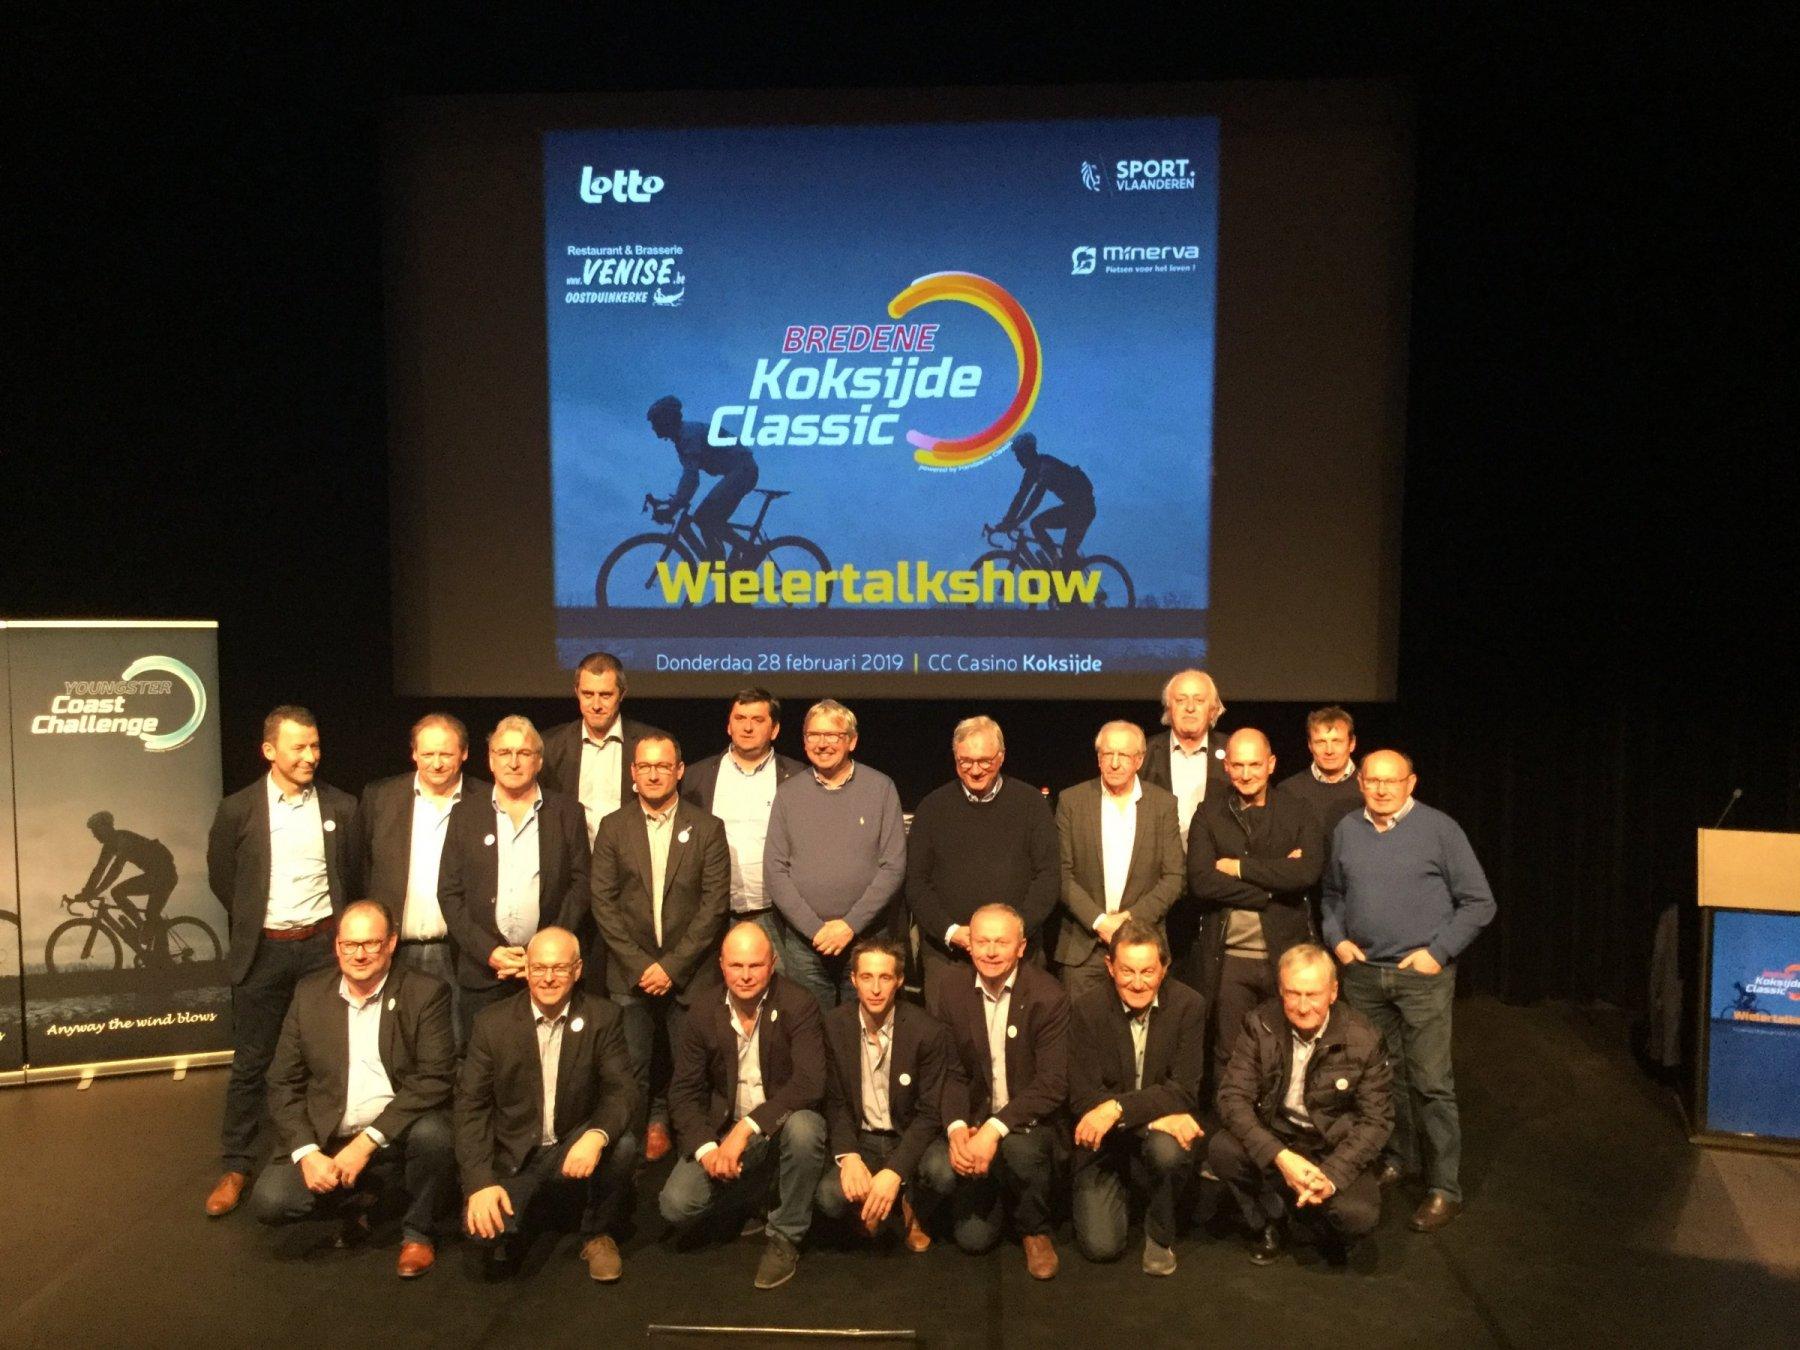 Bredene Koksijde Classic wielertalkshow 28-02-2019